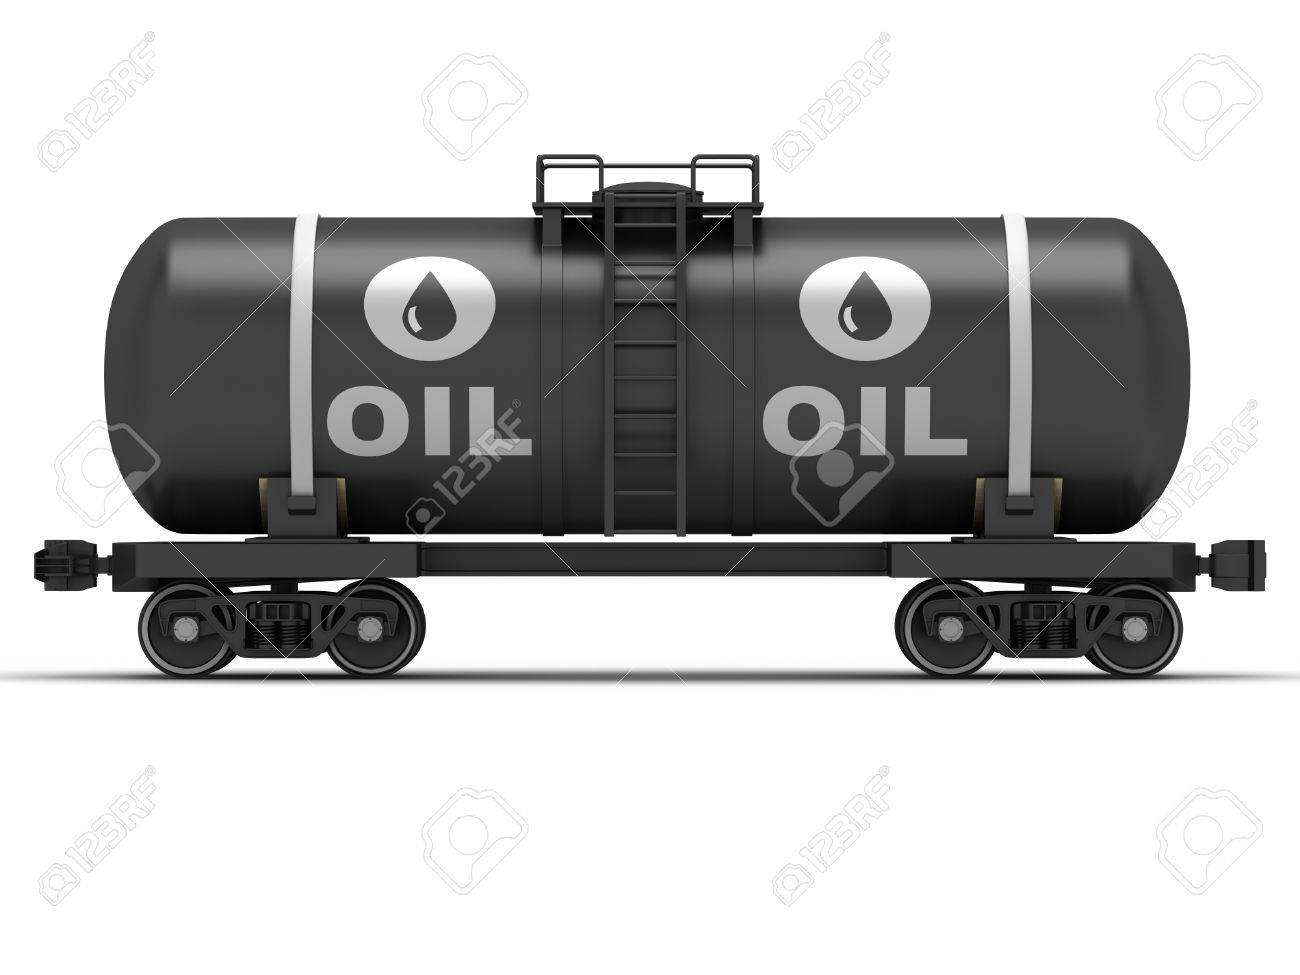 Railroad tank wagon on a white background Stock Photo - 17245201